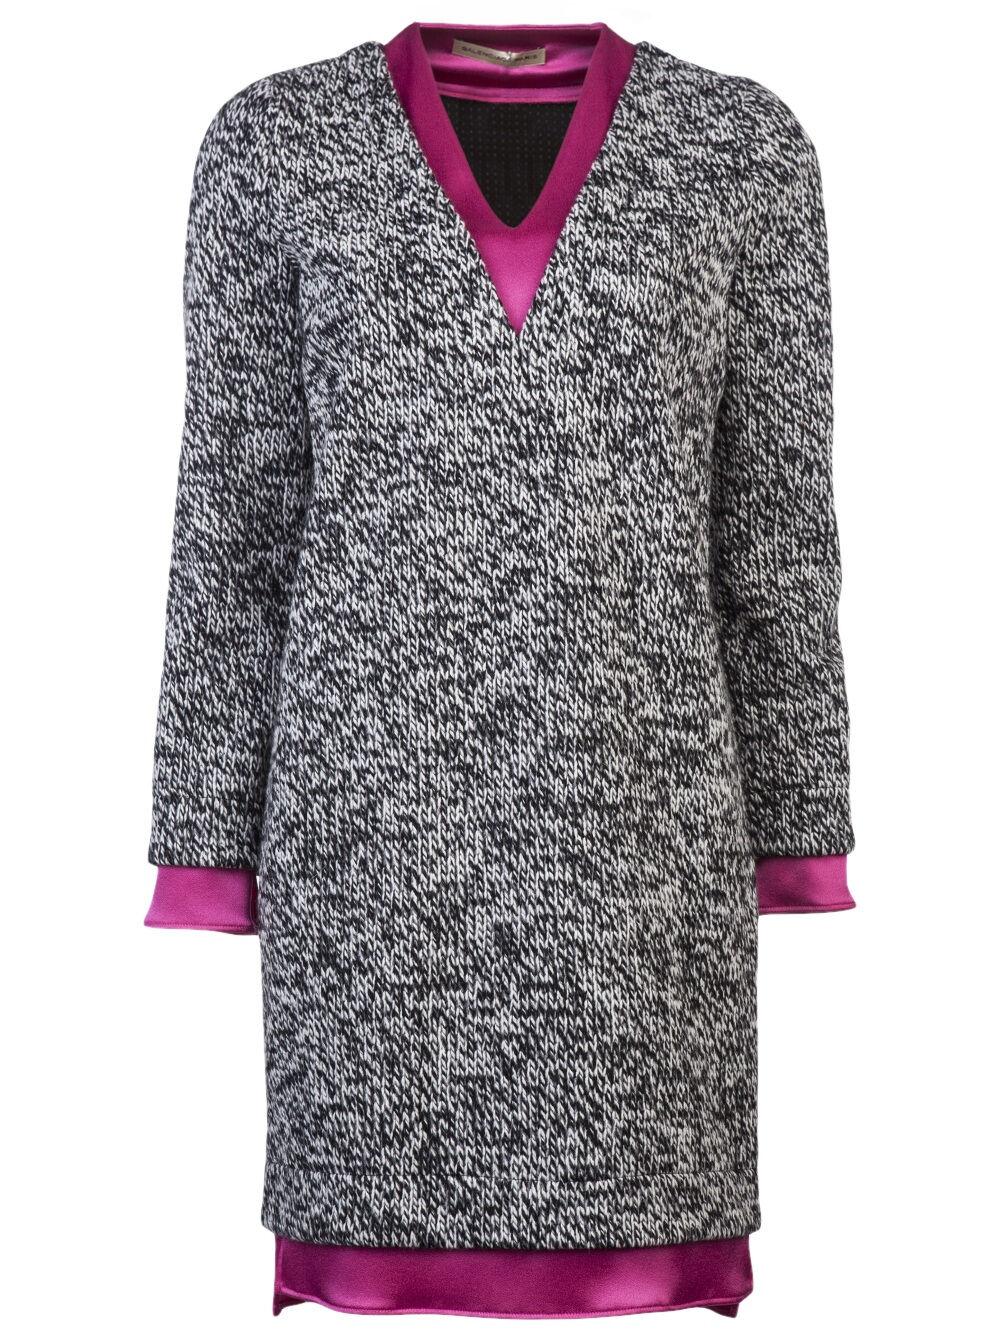 Balenciaga Vrigin Wool Sweater Dress FR 40  1895